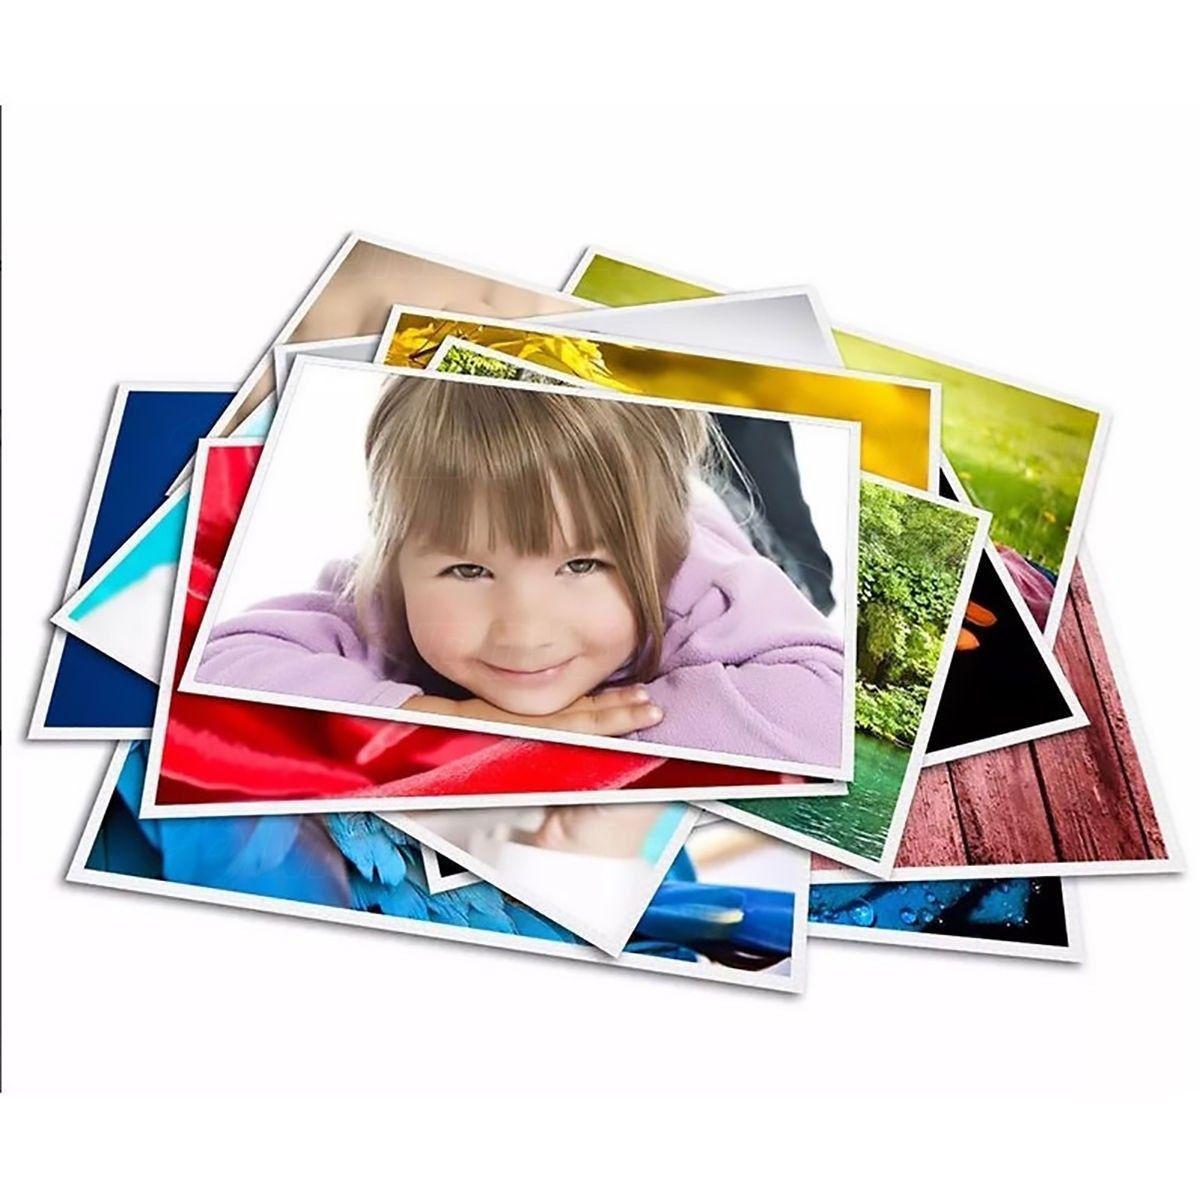 Papel Fotográfico Auto Adesivo 135g A4  50 Folhas